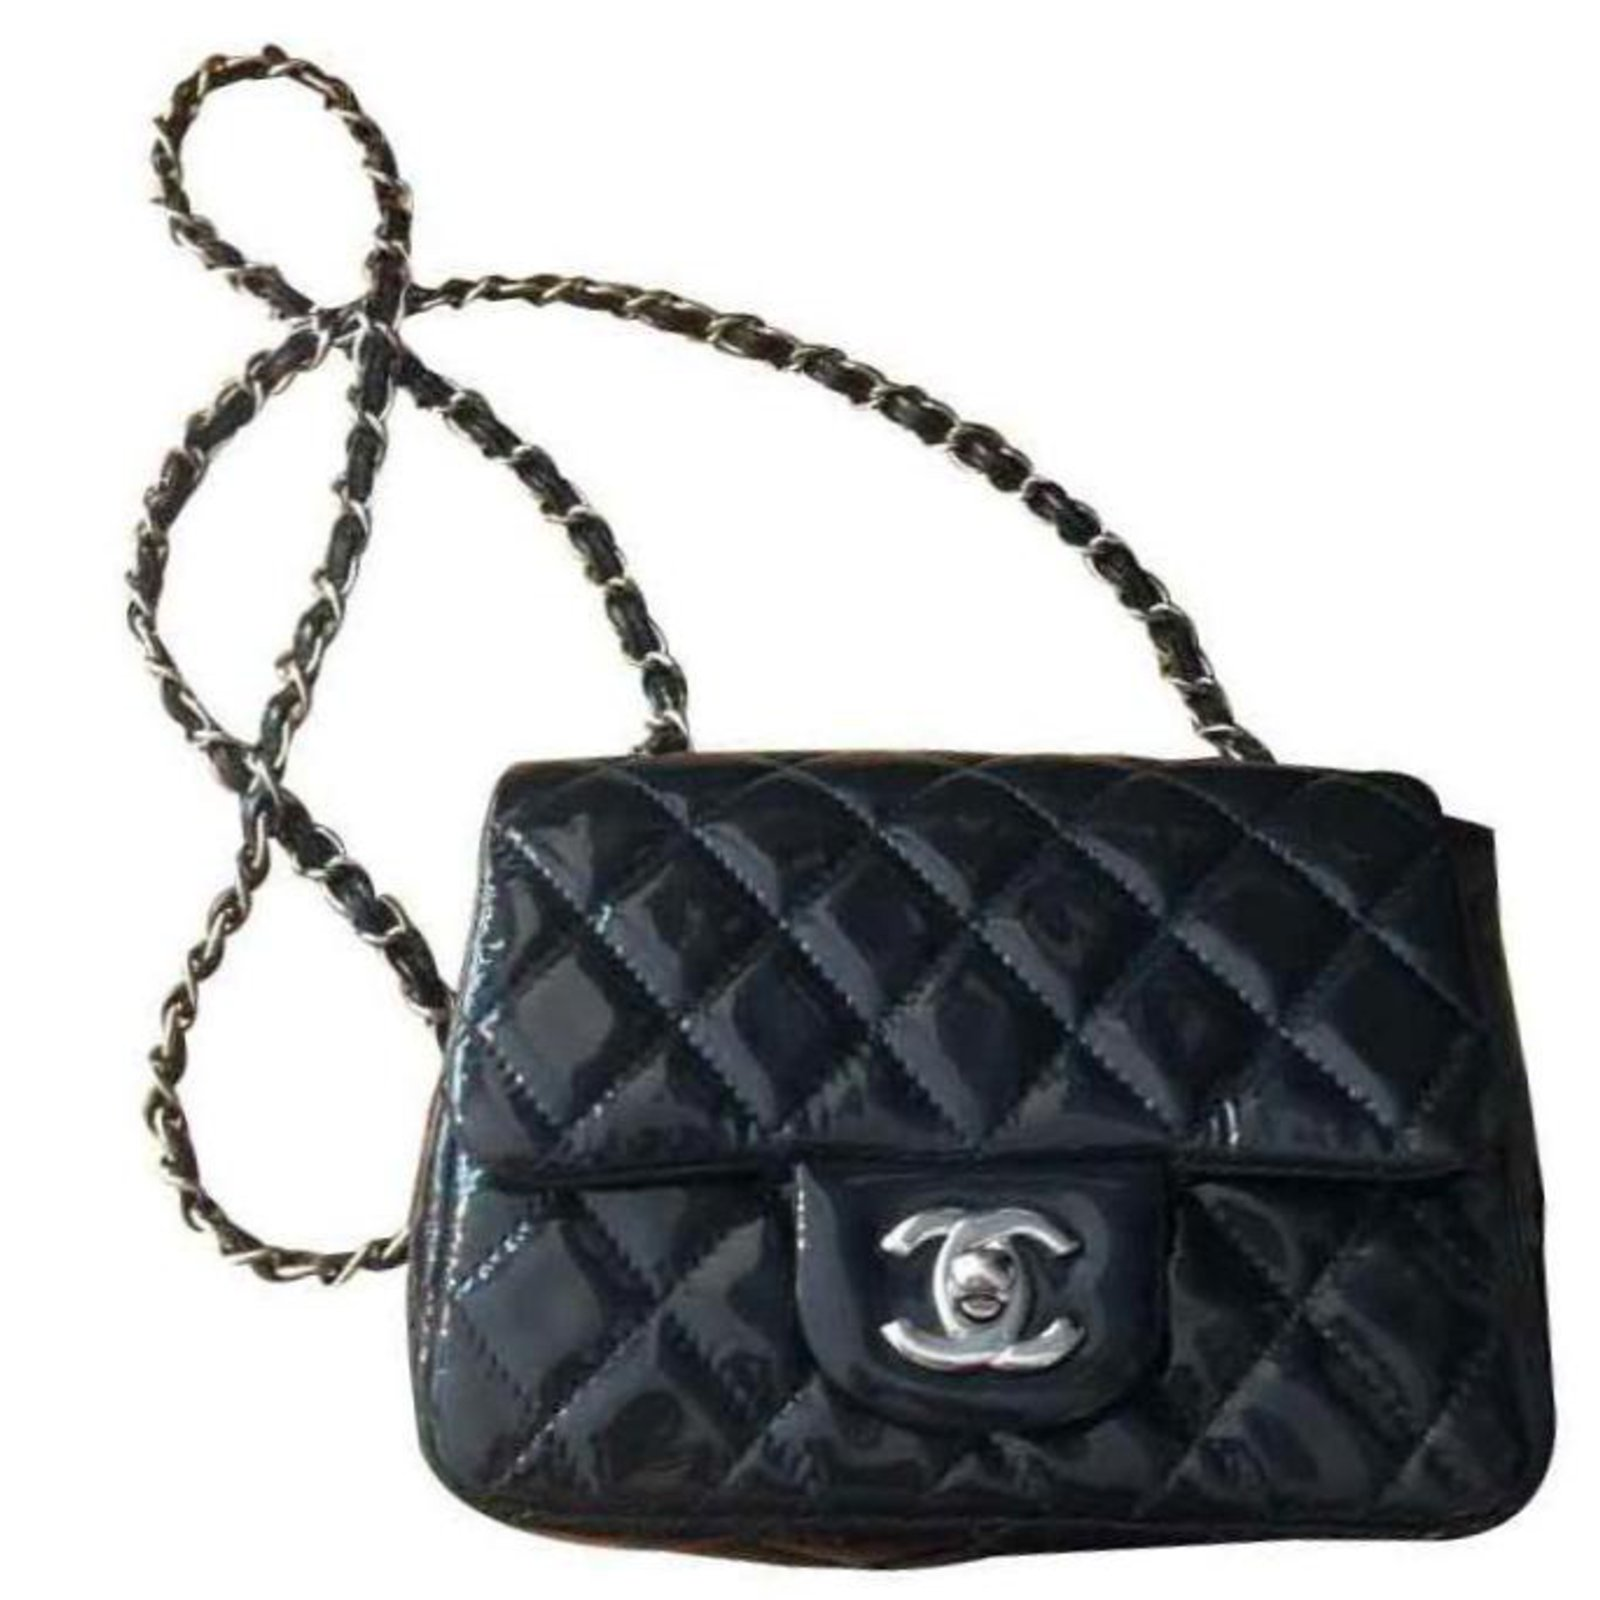 Classique Leather Crossbody Bag